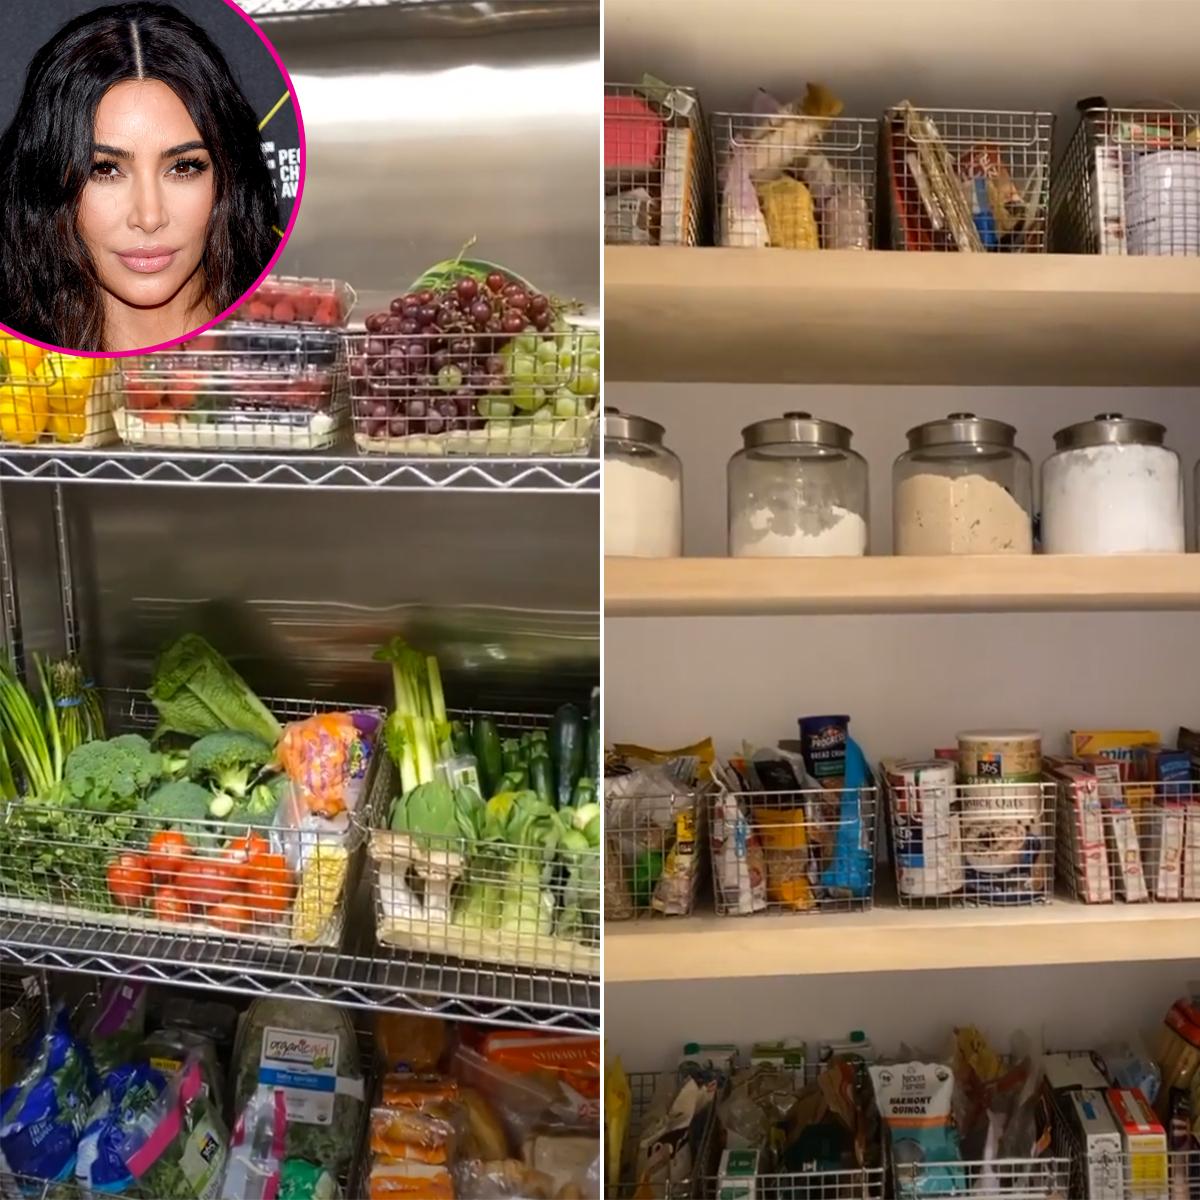 Kim Kardashian Shows Off Her Pantry